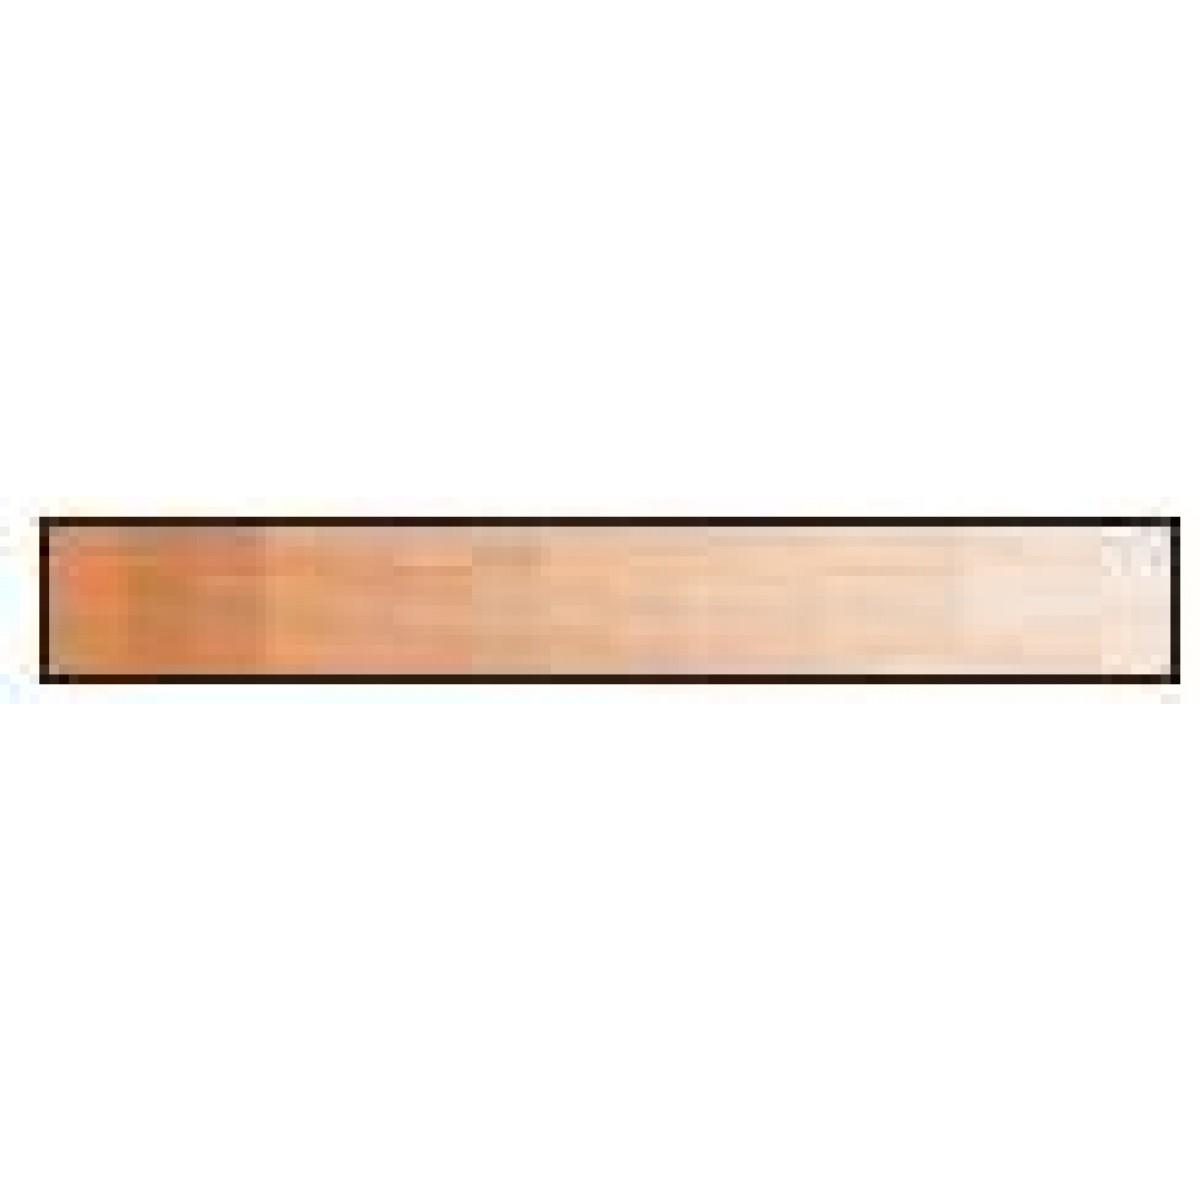 8503 Kunstnerkvalitet soft pastel Gold ochre